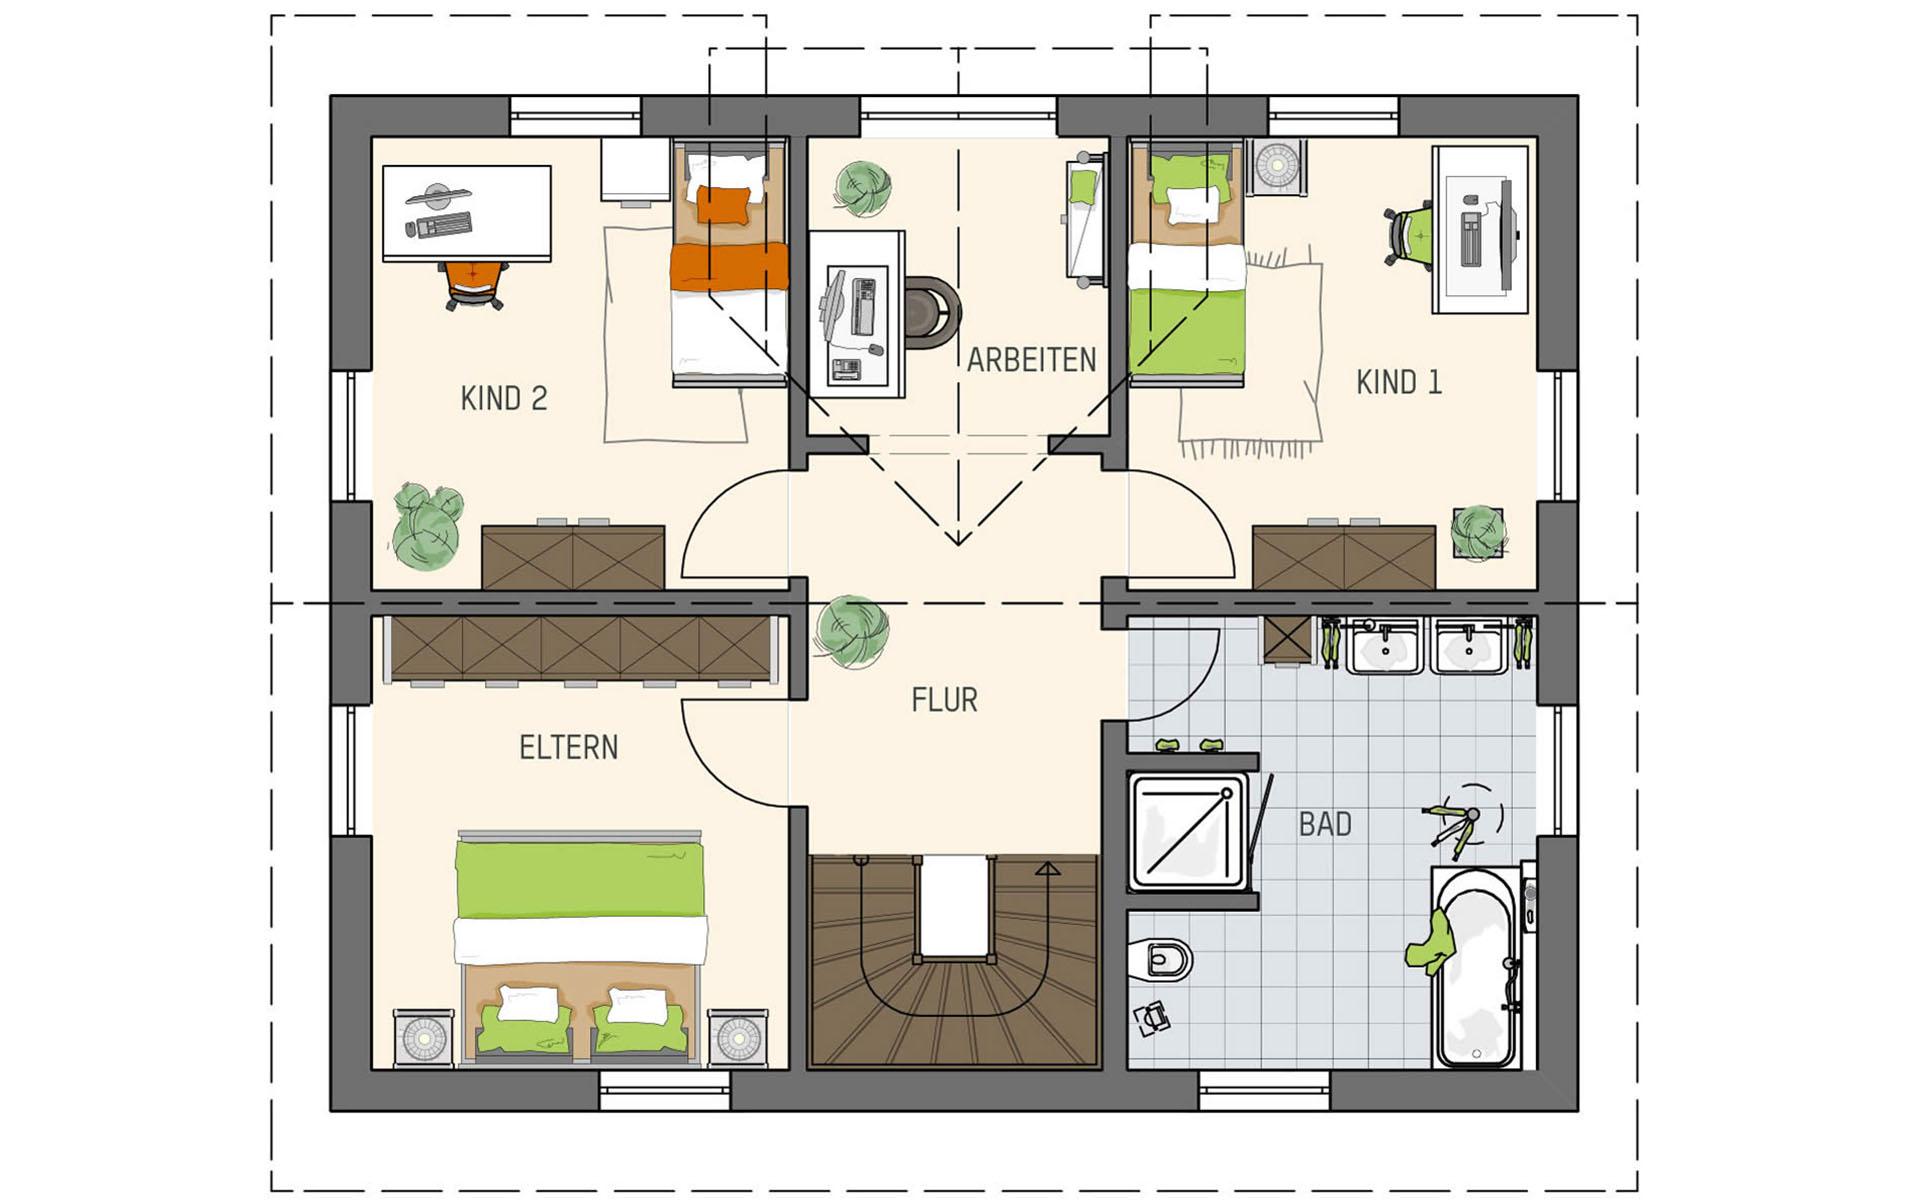 Dachgeschoss UNO 2.0 - Musterhaus Leipzig von FingerHaus GmbH